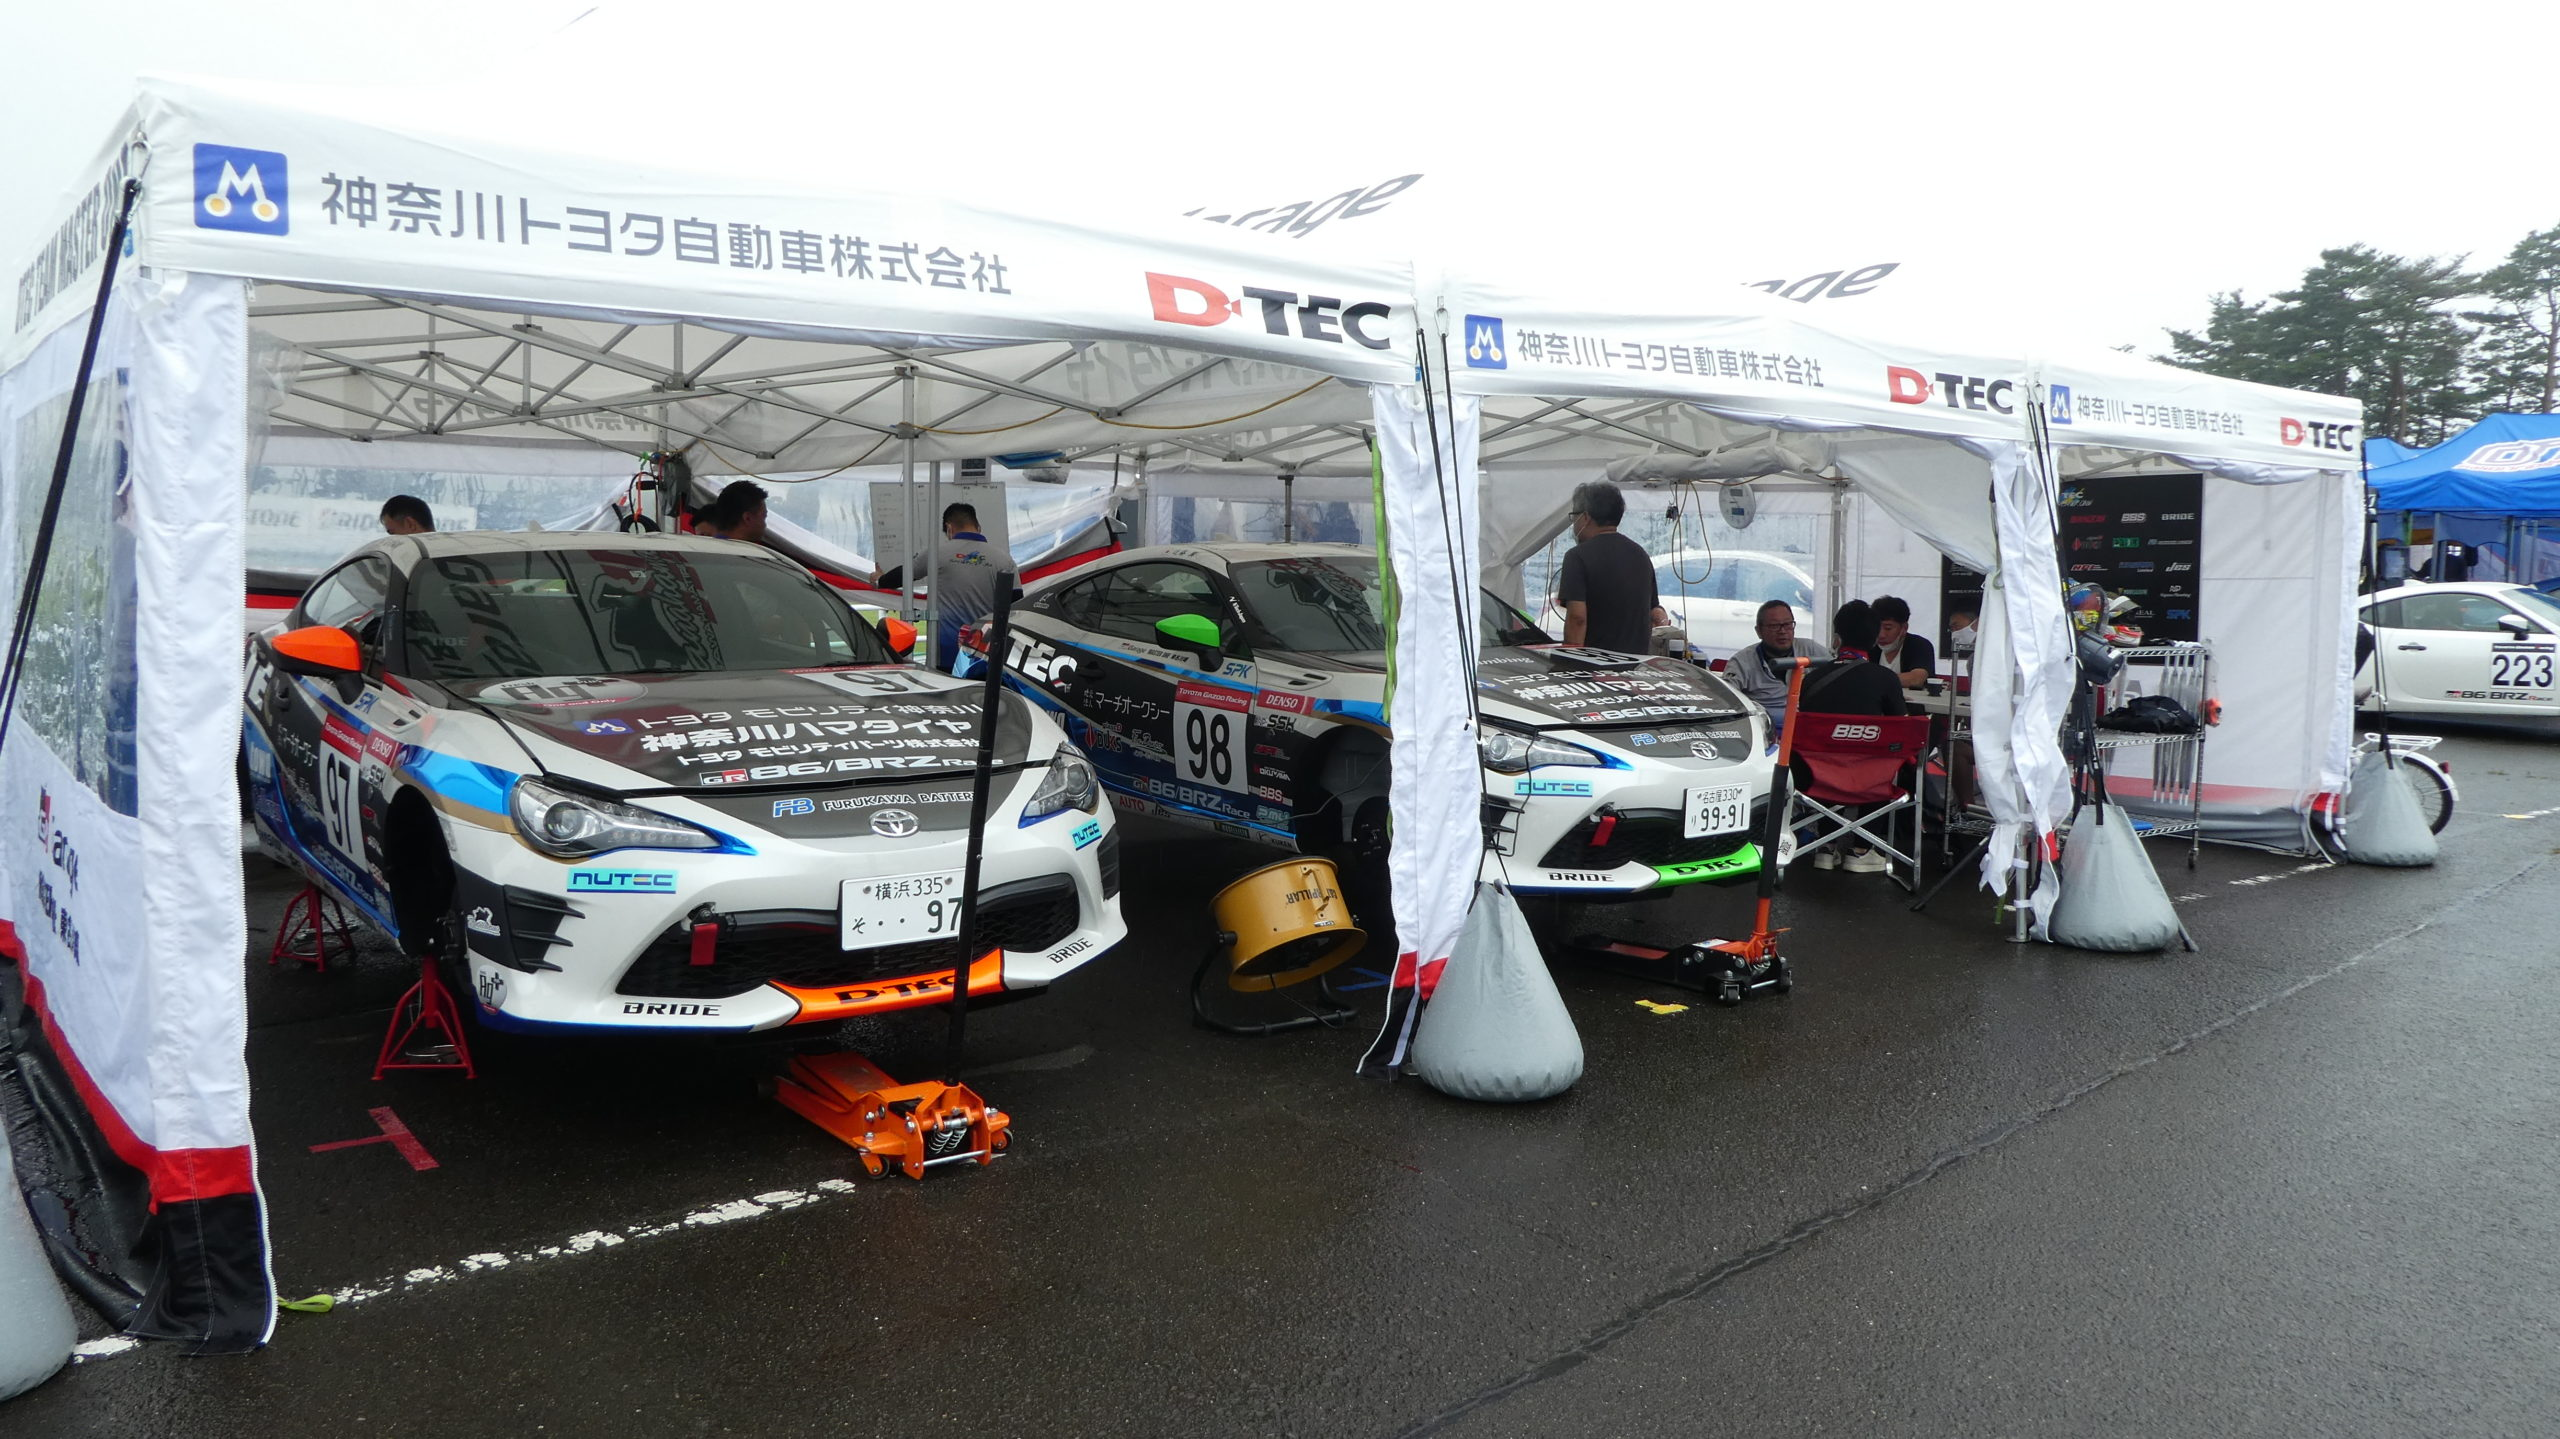 86/BRZ Race2020 第5戦 スポーツランドSUGO神奈川トヨタ DTEC TEAM MASTER ONE